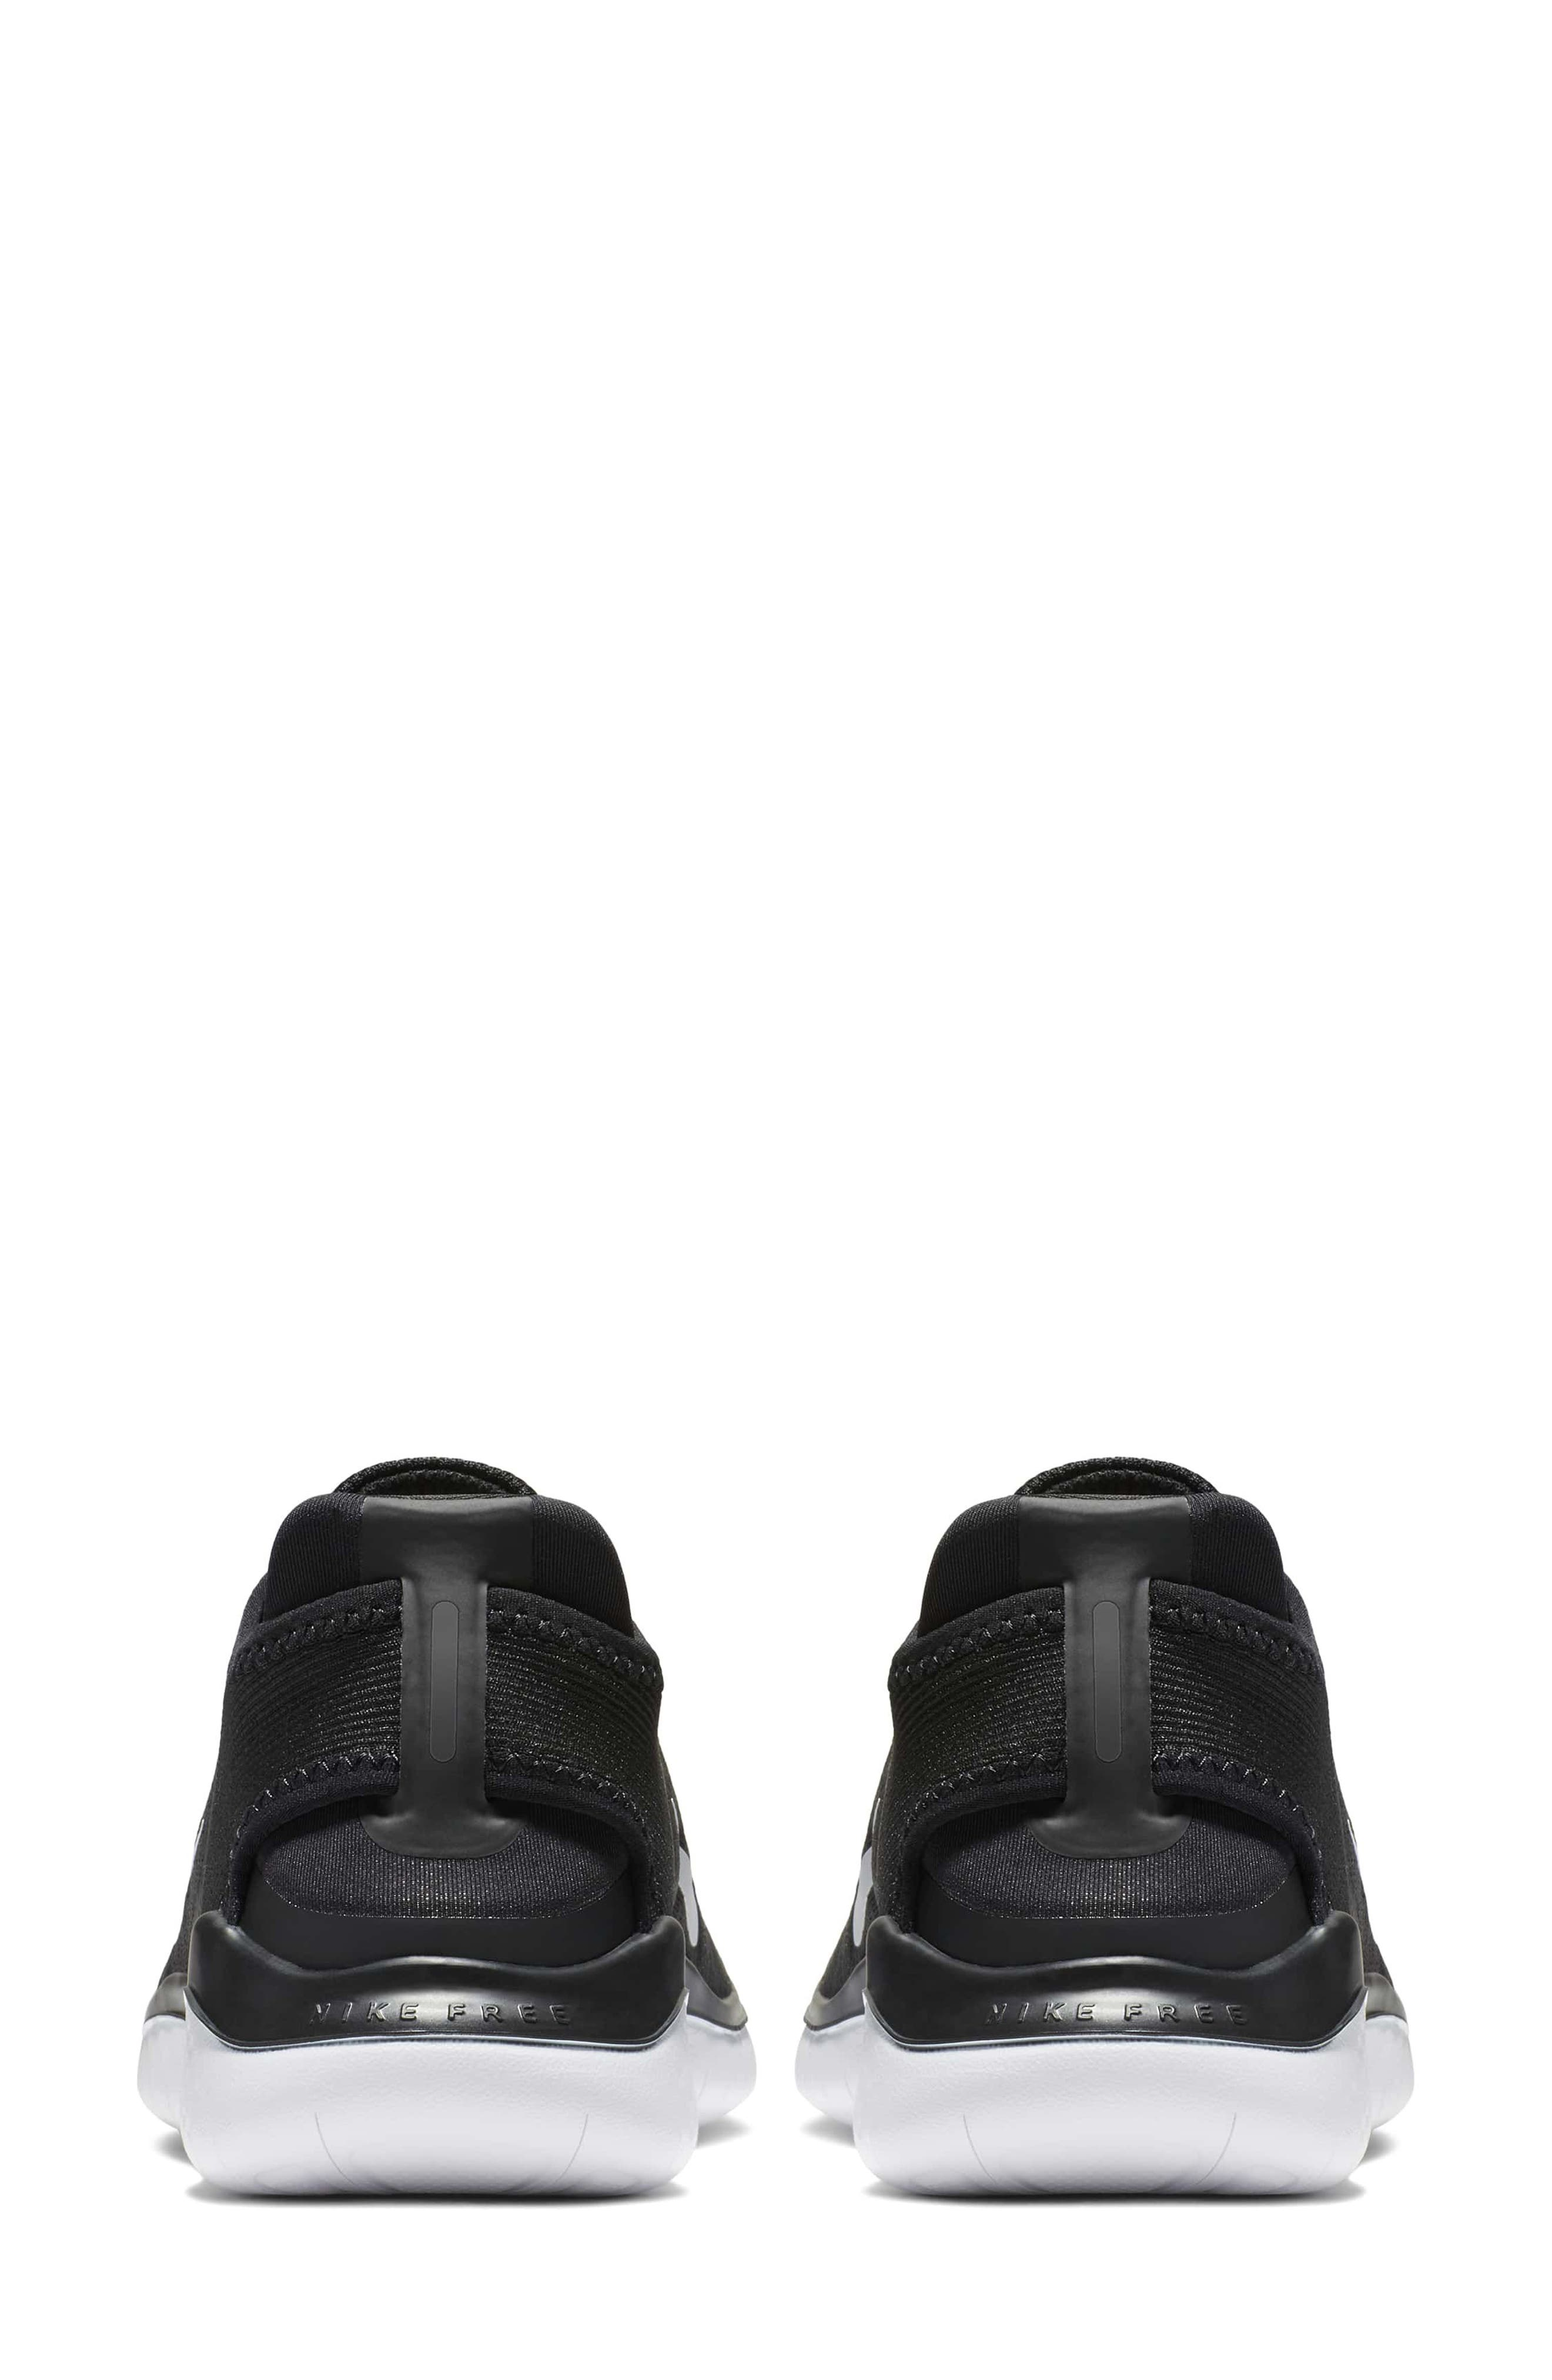 NIKE,                             Free RN 2018 Running Shoe,                             Alternate thumbnail 2, color,                             BLACK/ WHITE